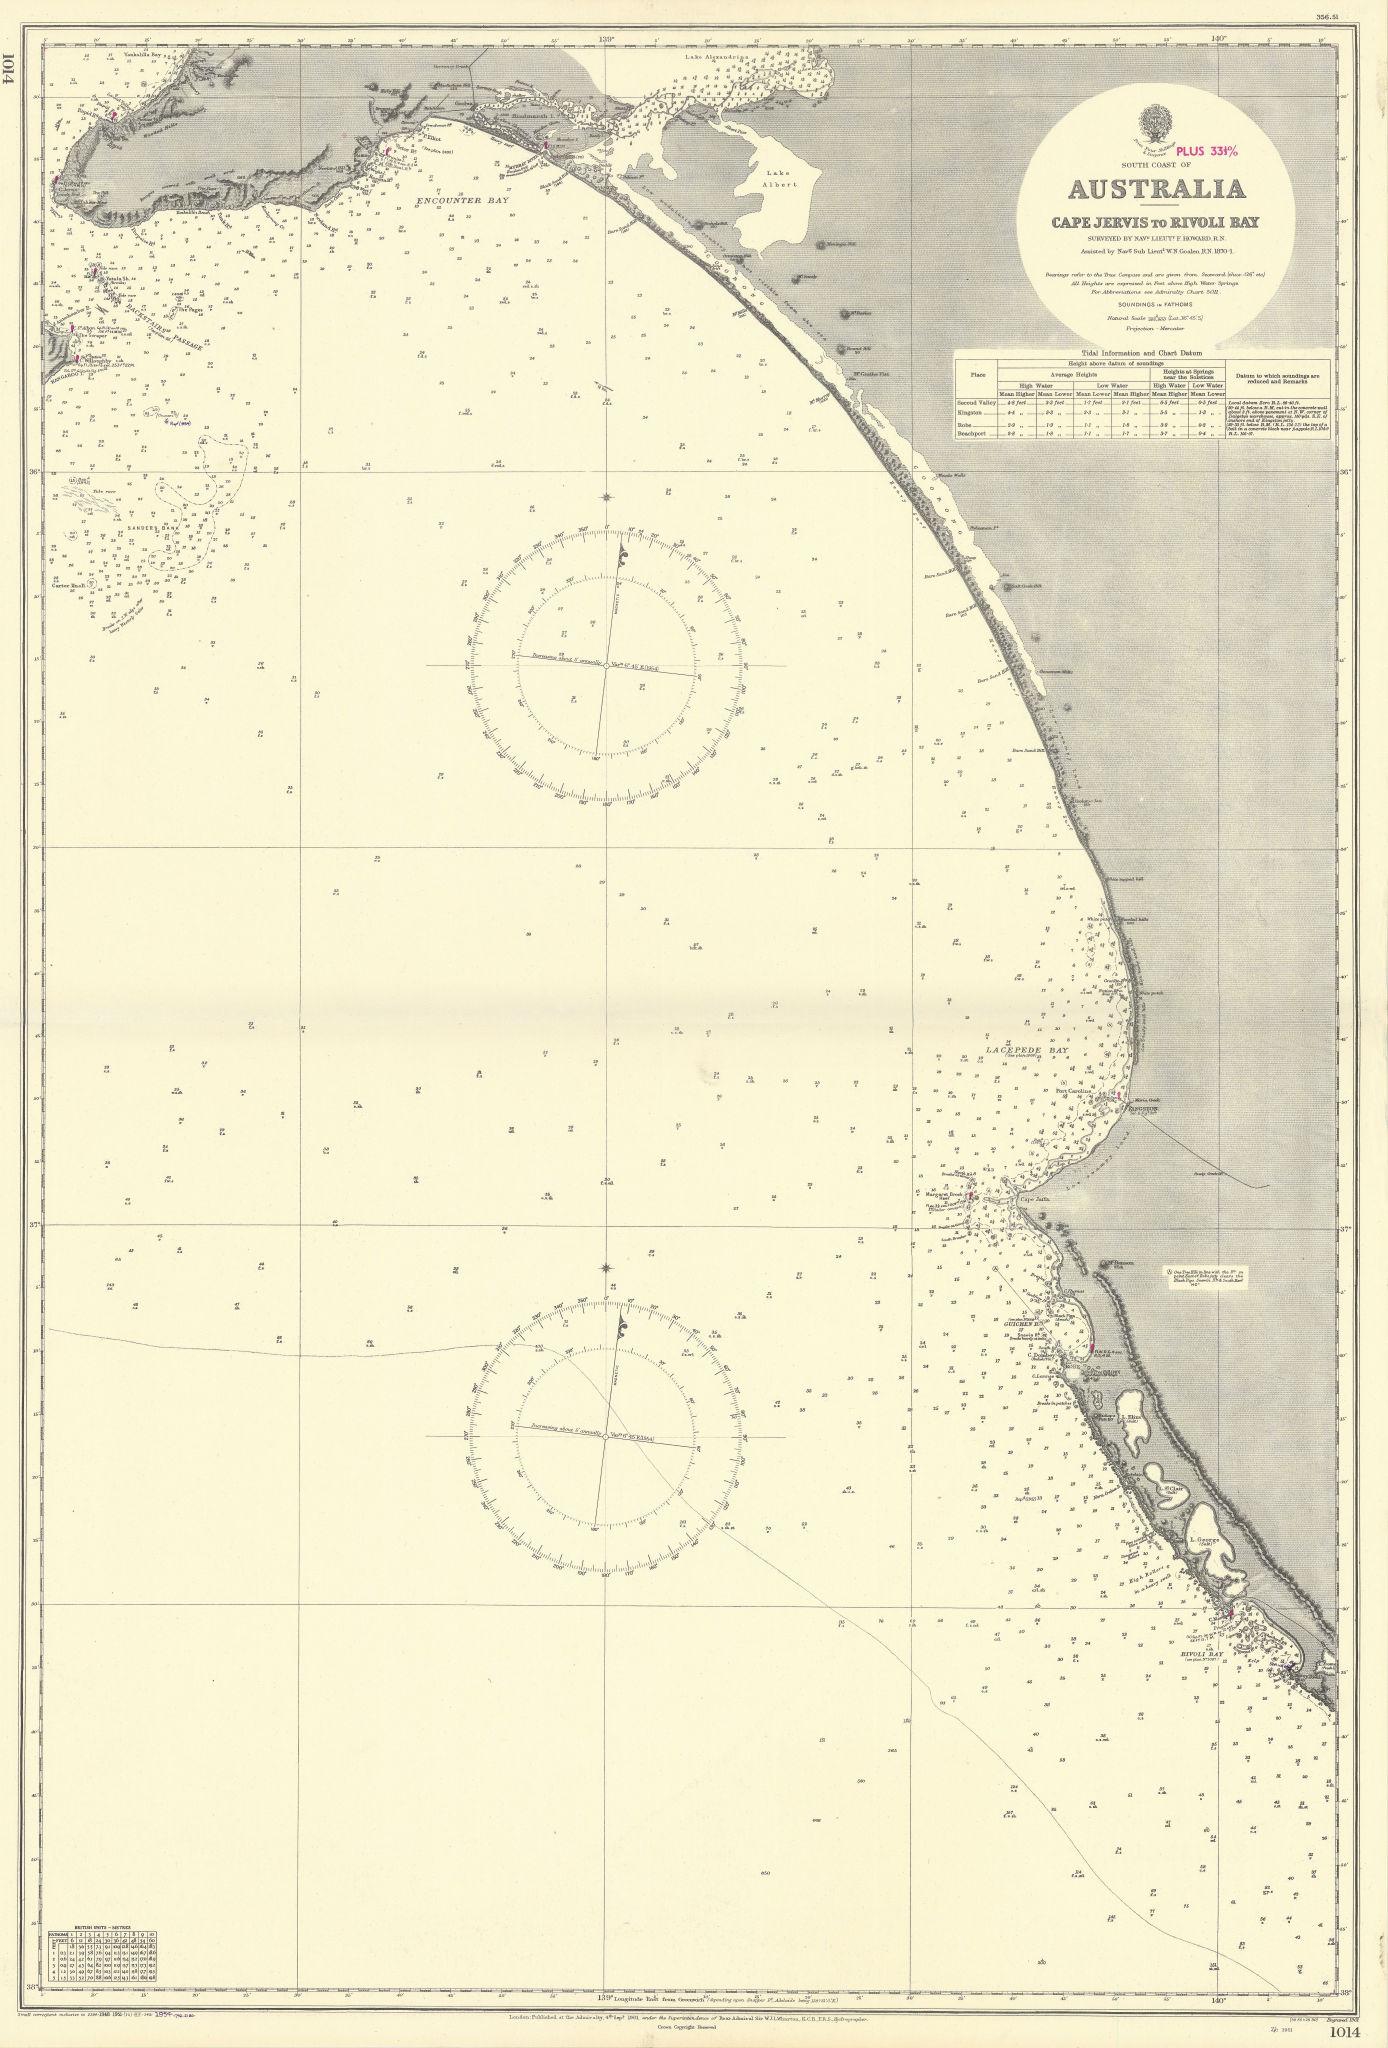 South Australia coast. Long Bay Cape Jervis. ADMIRALTY sea chart 1901 (1954) map